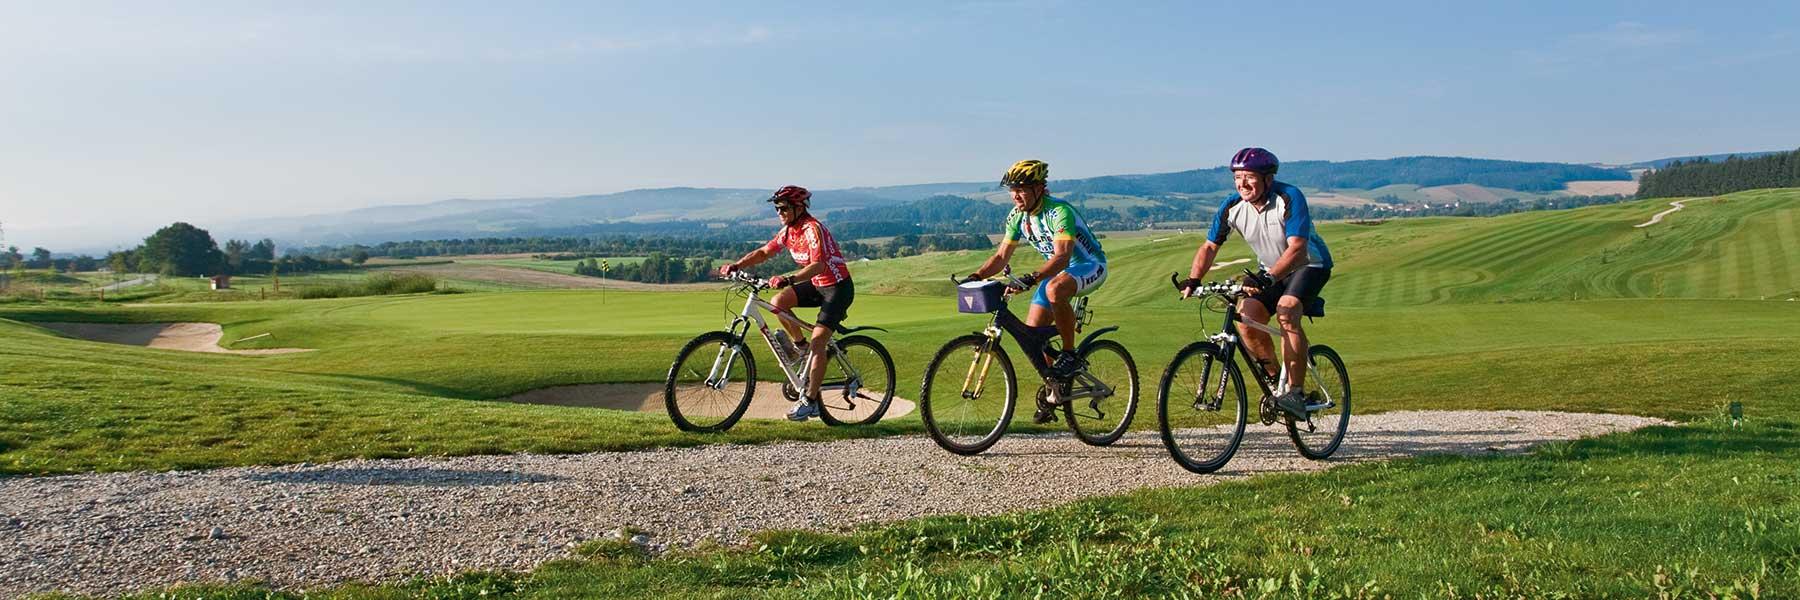 Rad fahren in Bad Birnbach im Rottal